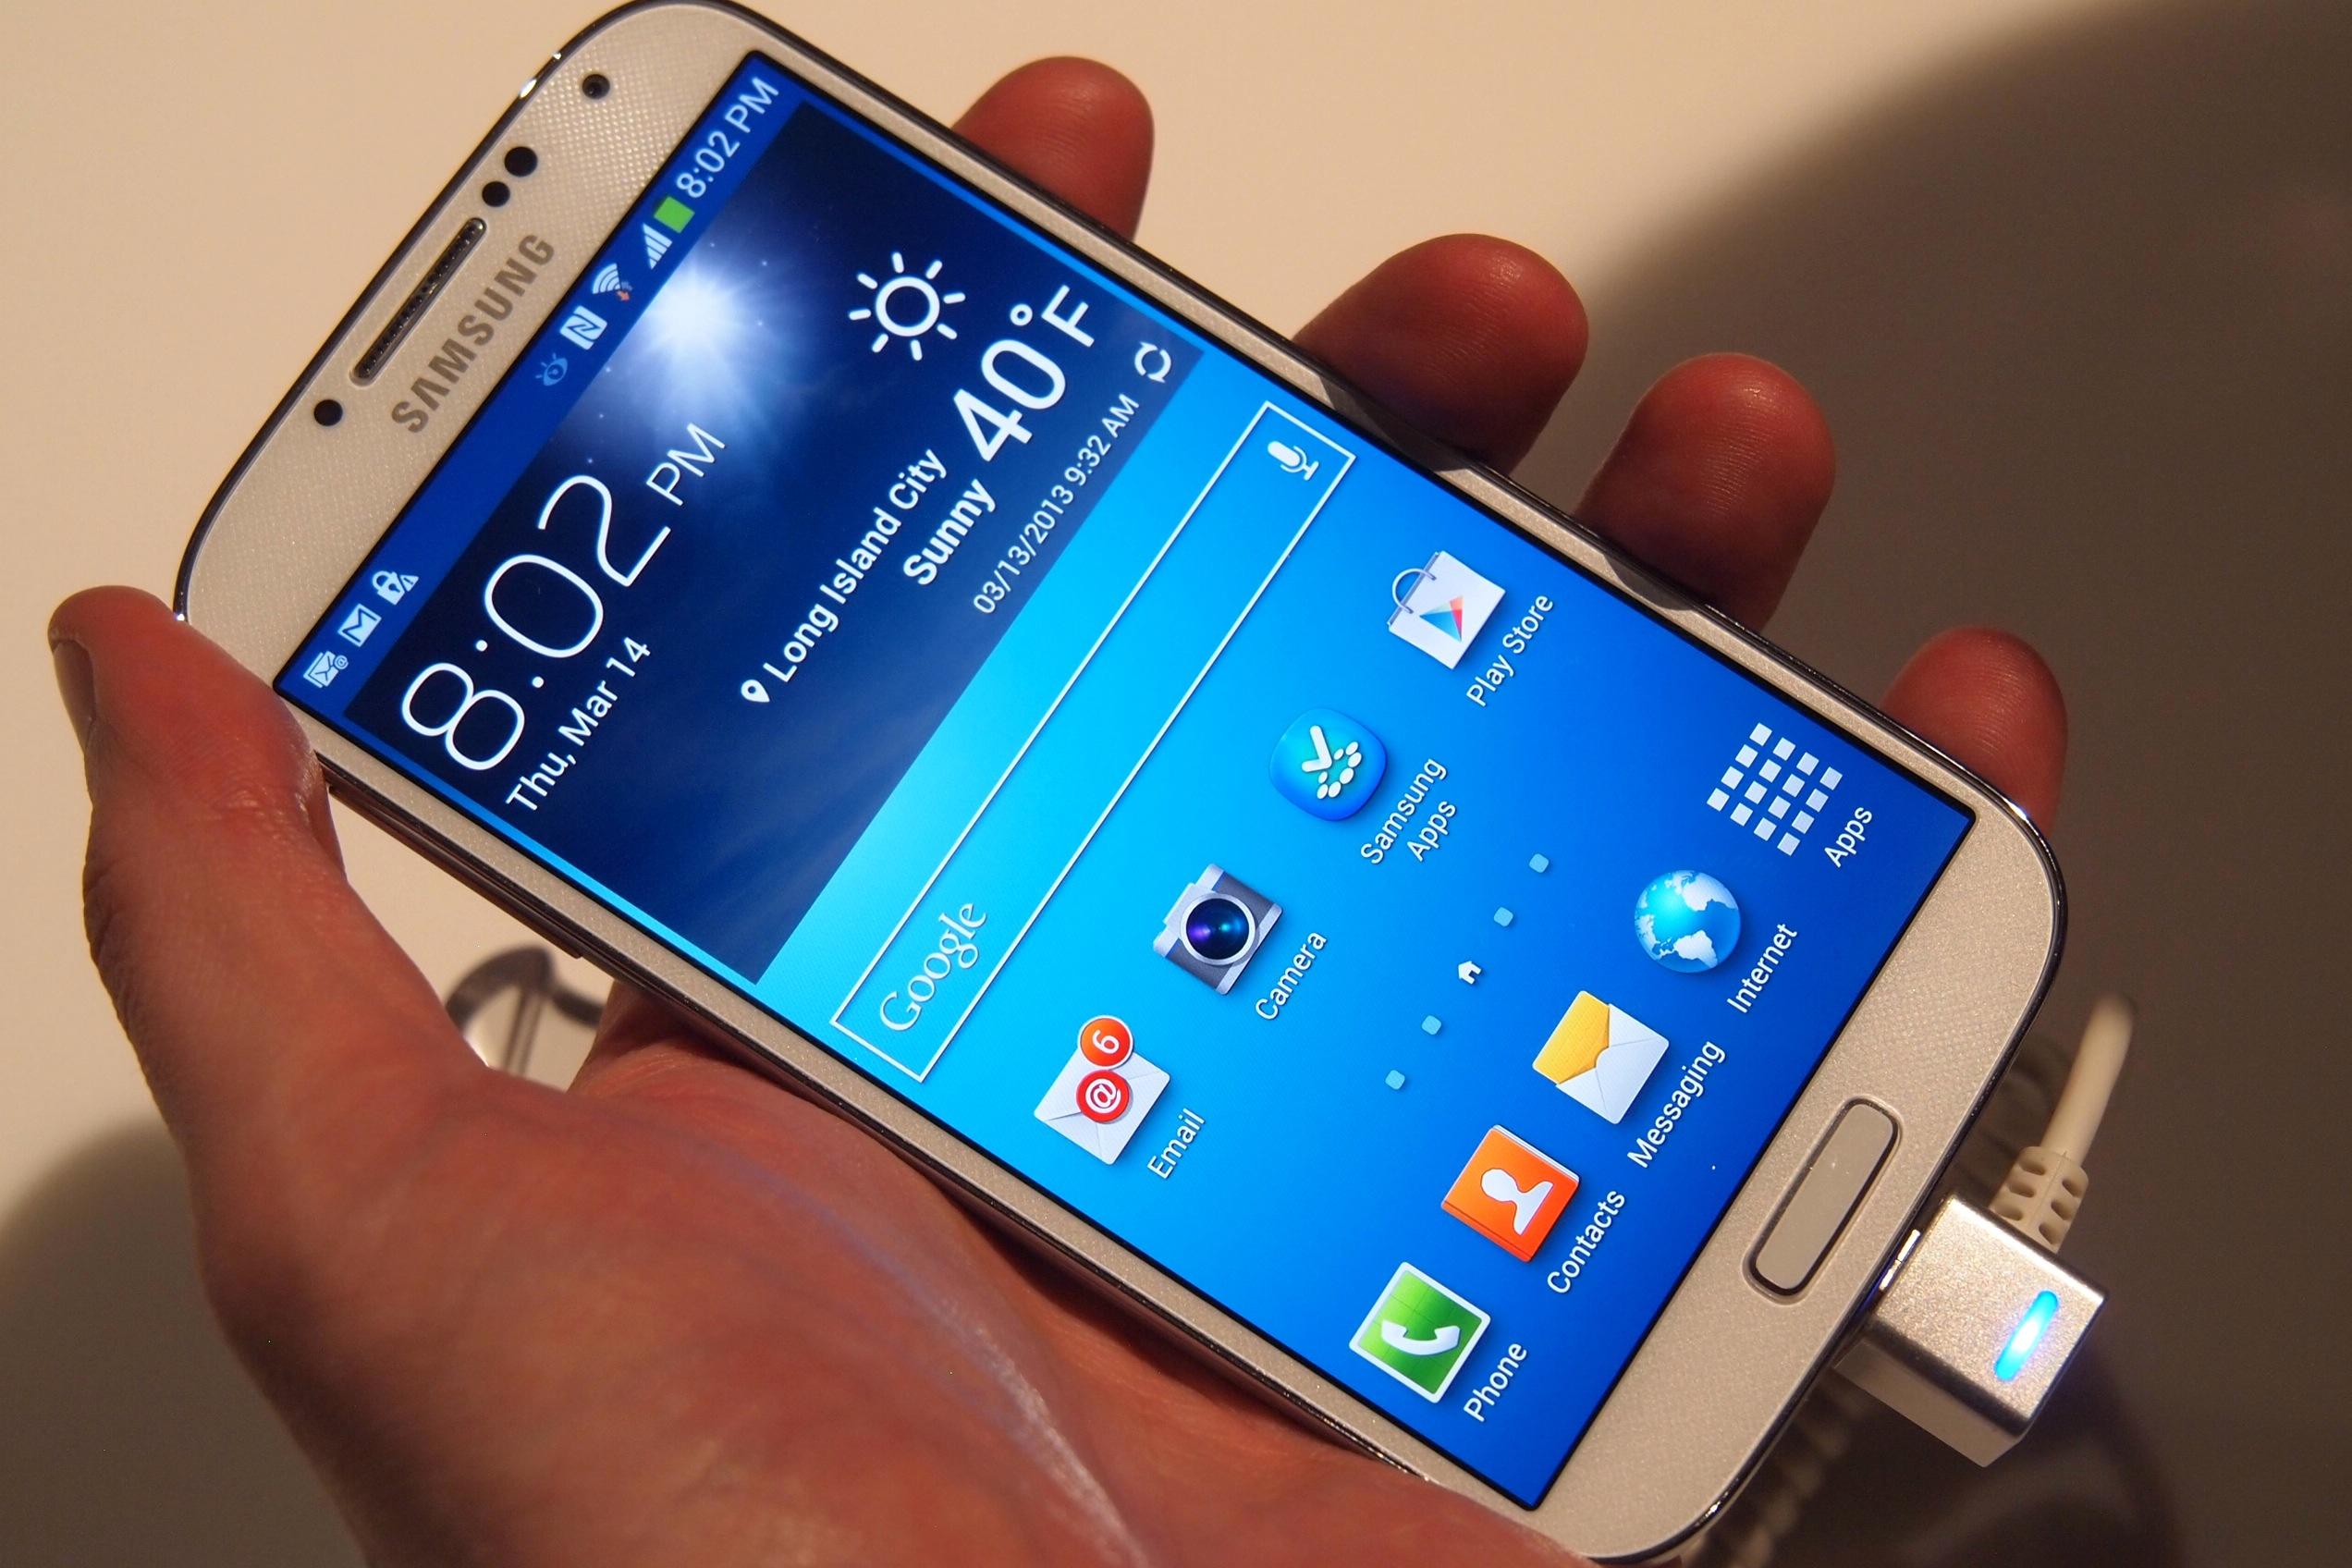 Samsung Galaxy S5 Siap Dipasarkan 2 Maret 2014